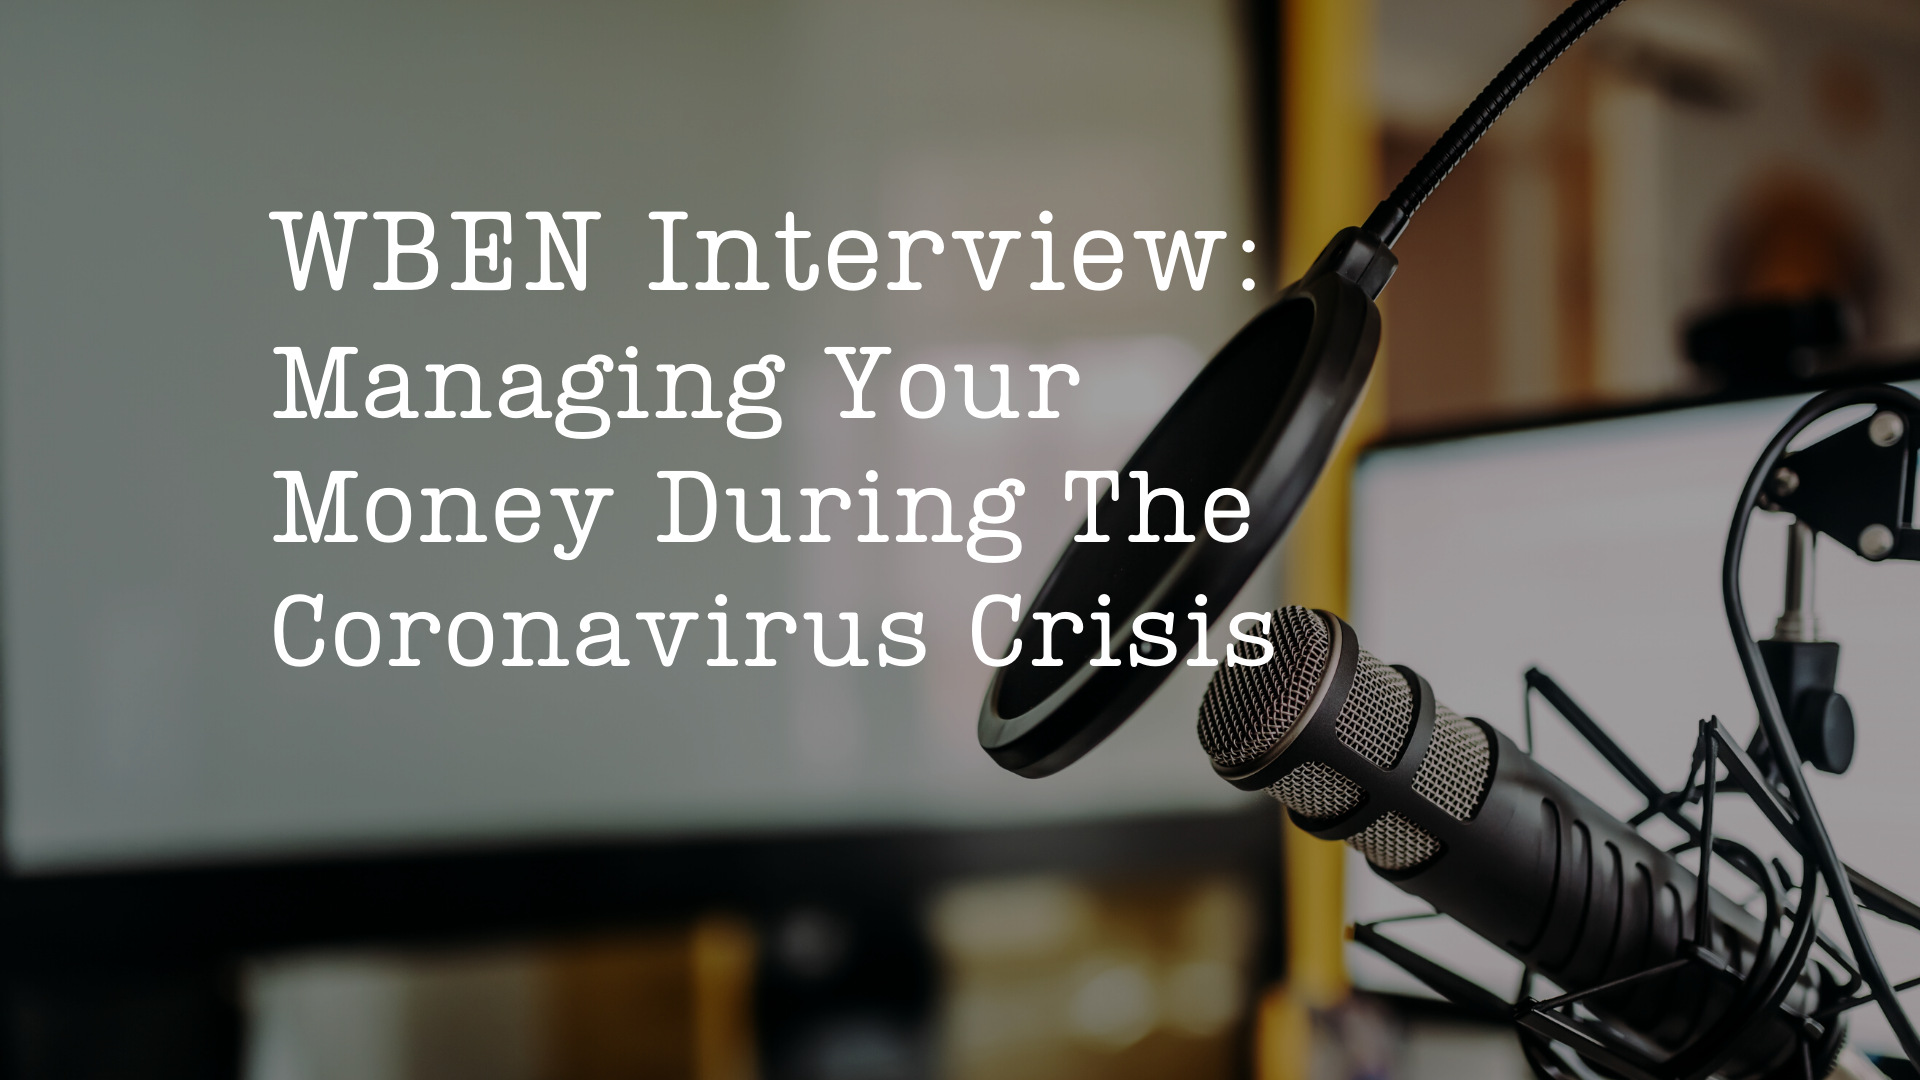 WBEN Interview: Managing Your Money During The Coronavirus Crisis